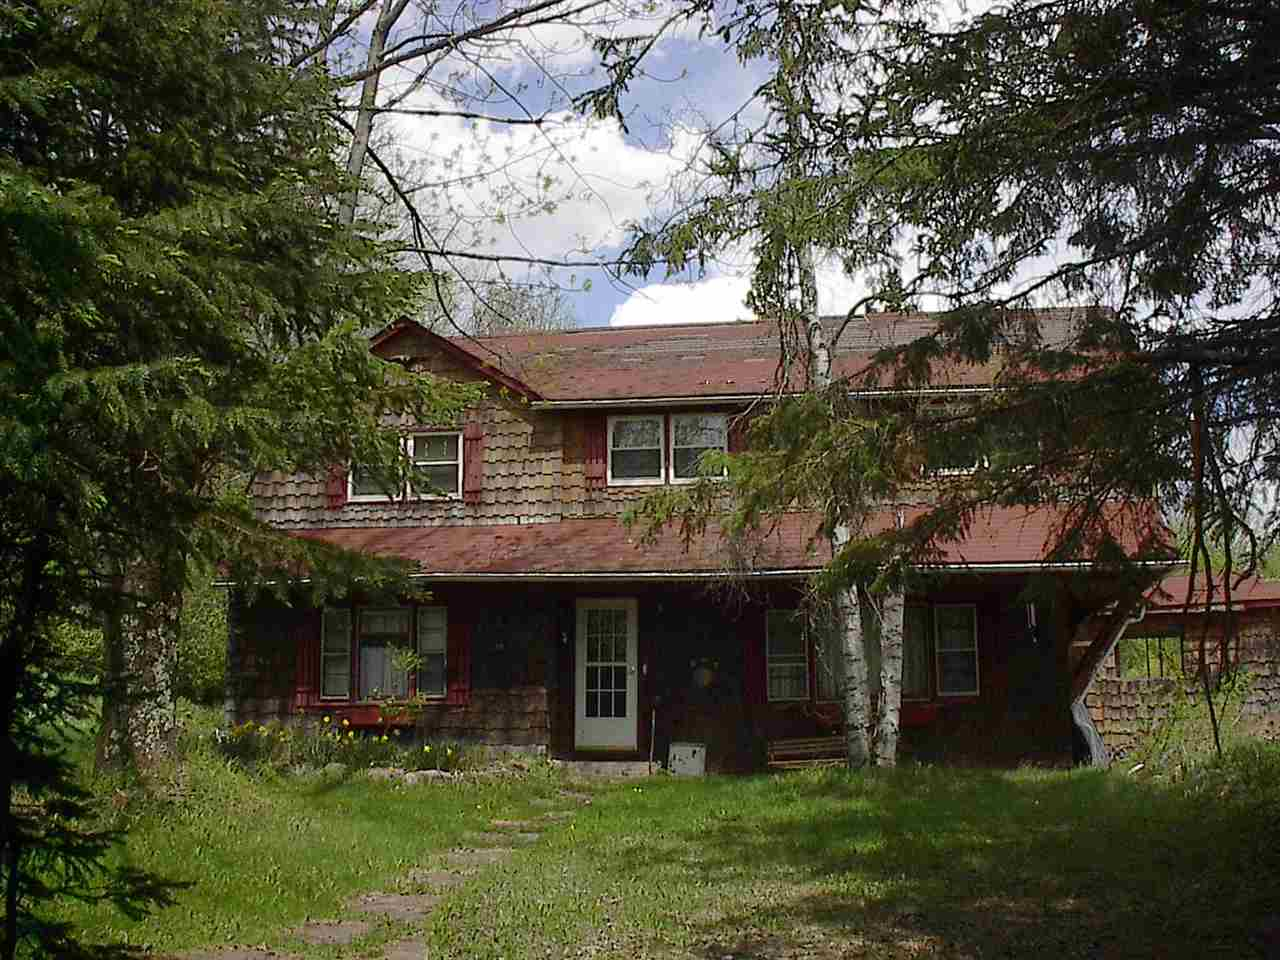 Real Estate for Sale, ListingId: 37037089, Parksville,NY12768